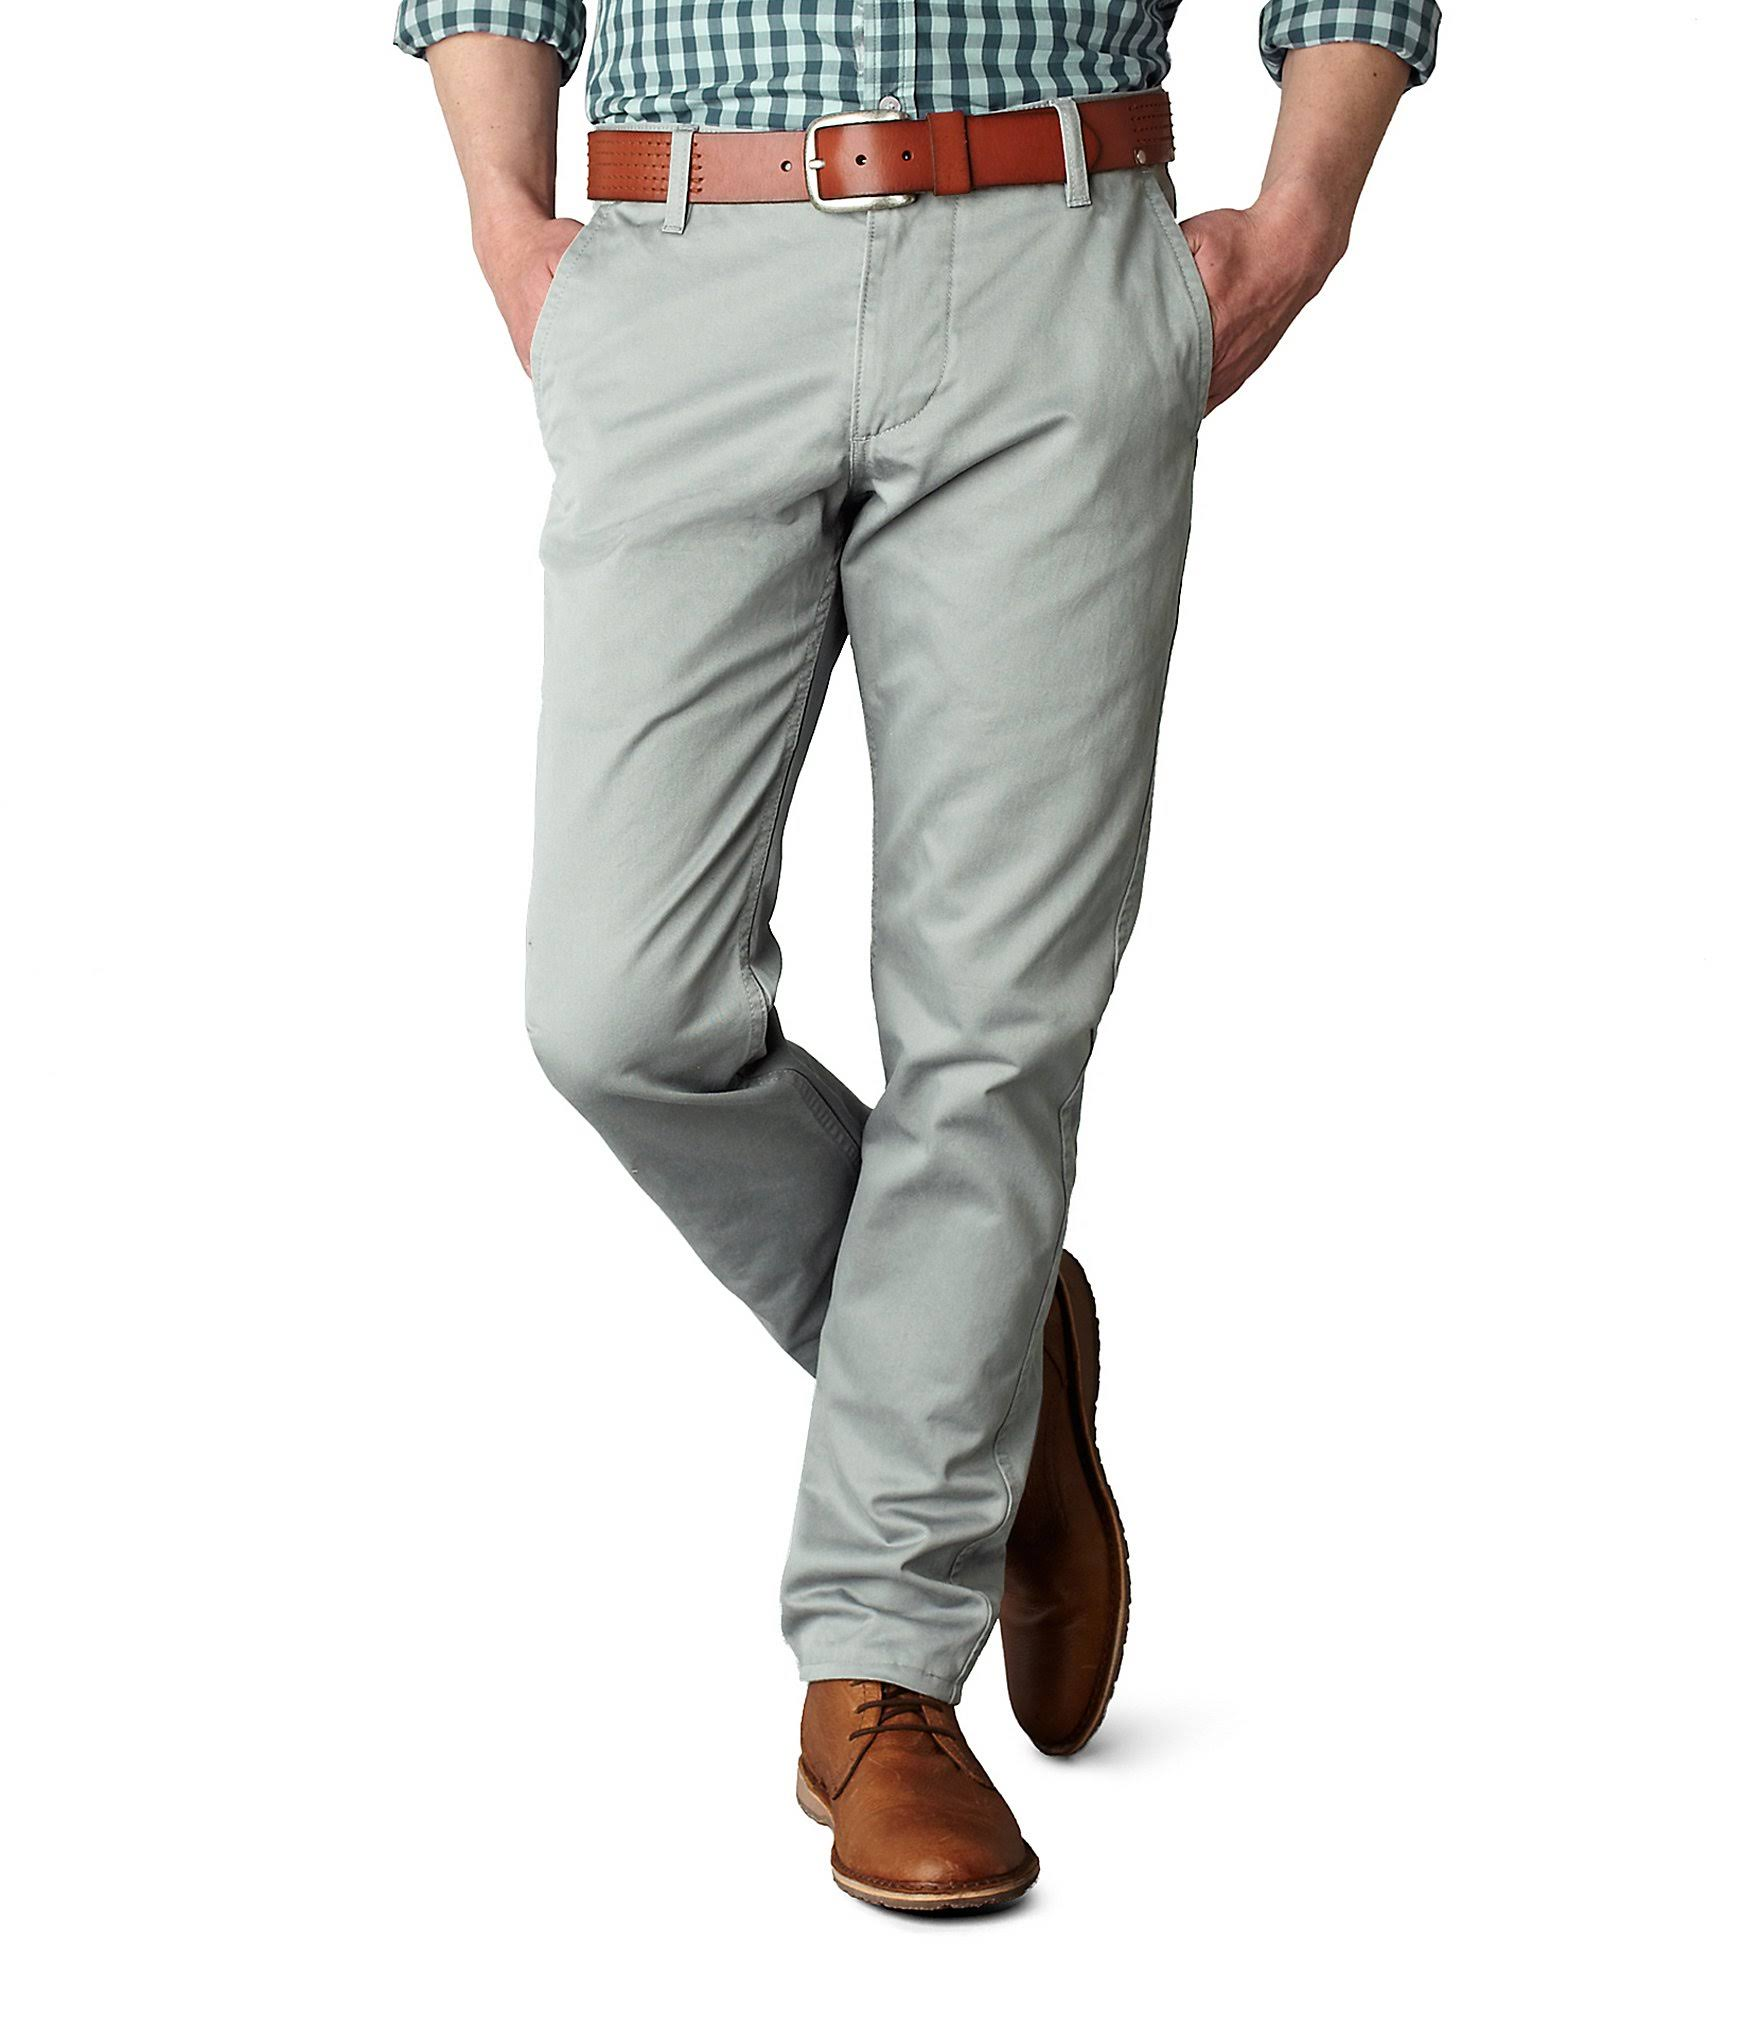 Burma 34x29 Pantaloni Grigio Docker TaperedUomo KhakiSlim Alpha dxerCoB